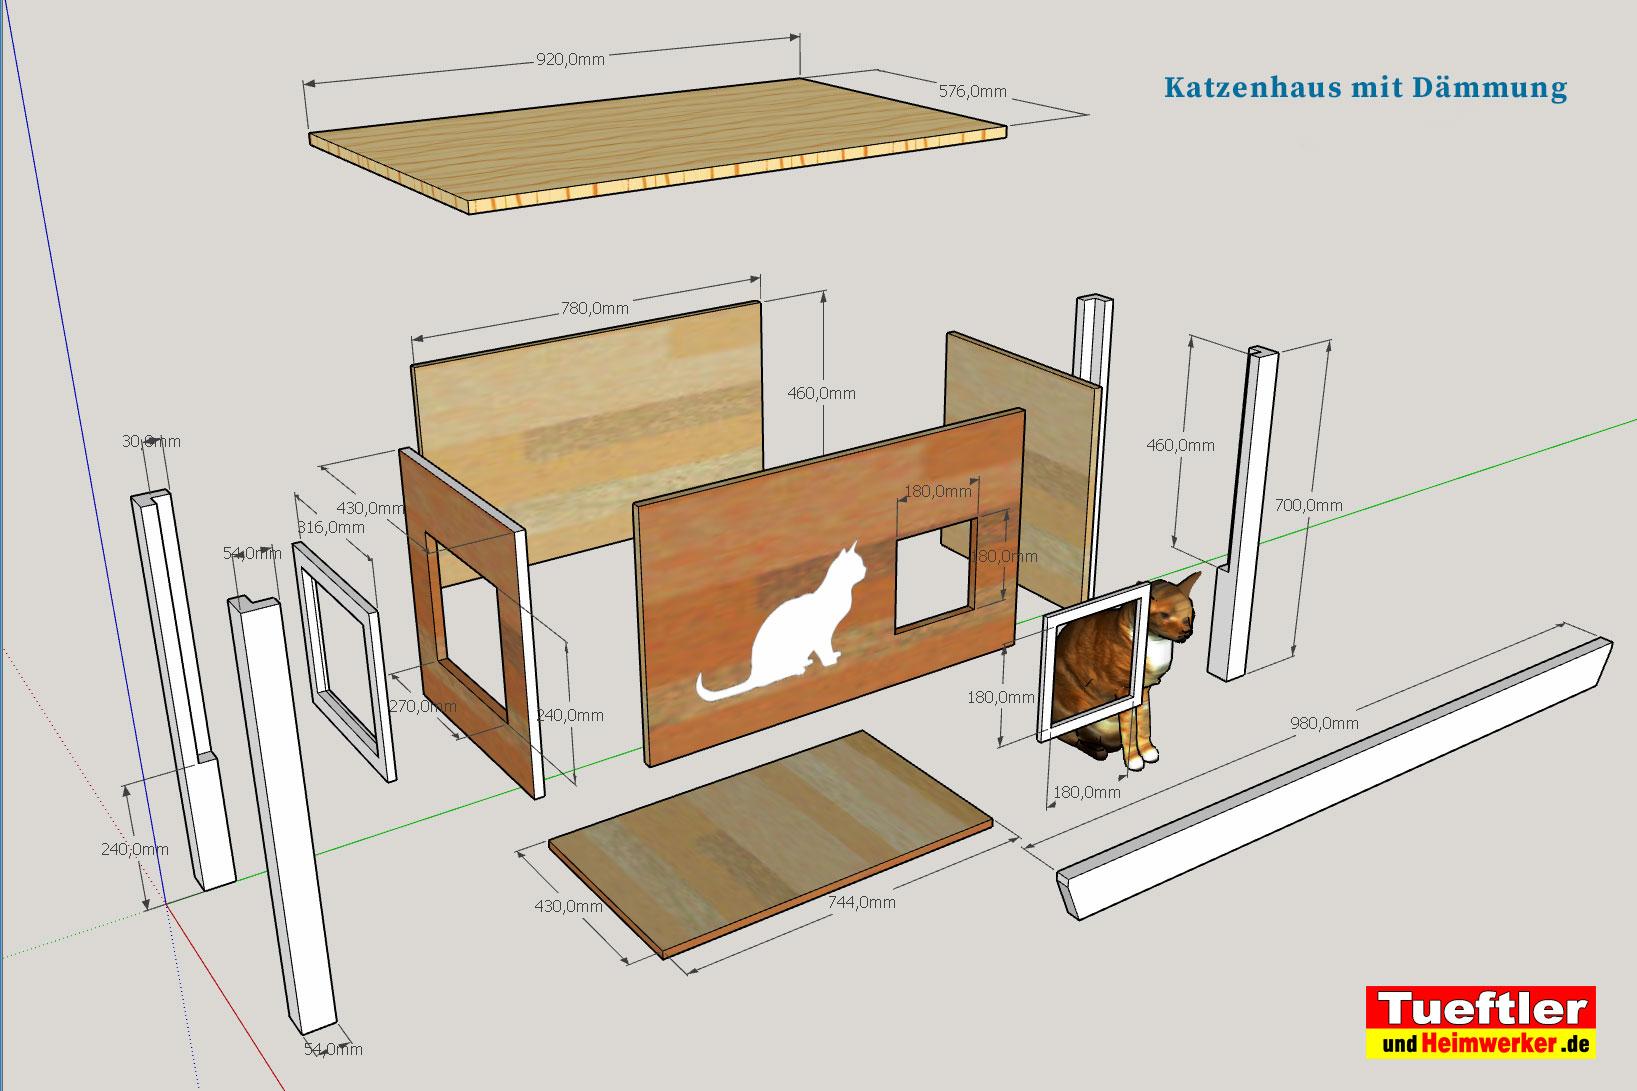 katzenhaus aus karton selber bauen latest katzen haus with katzenhaus aus karton selber bauen. Black Bedroom Furniture Sets. Home Design Ideas